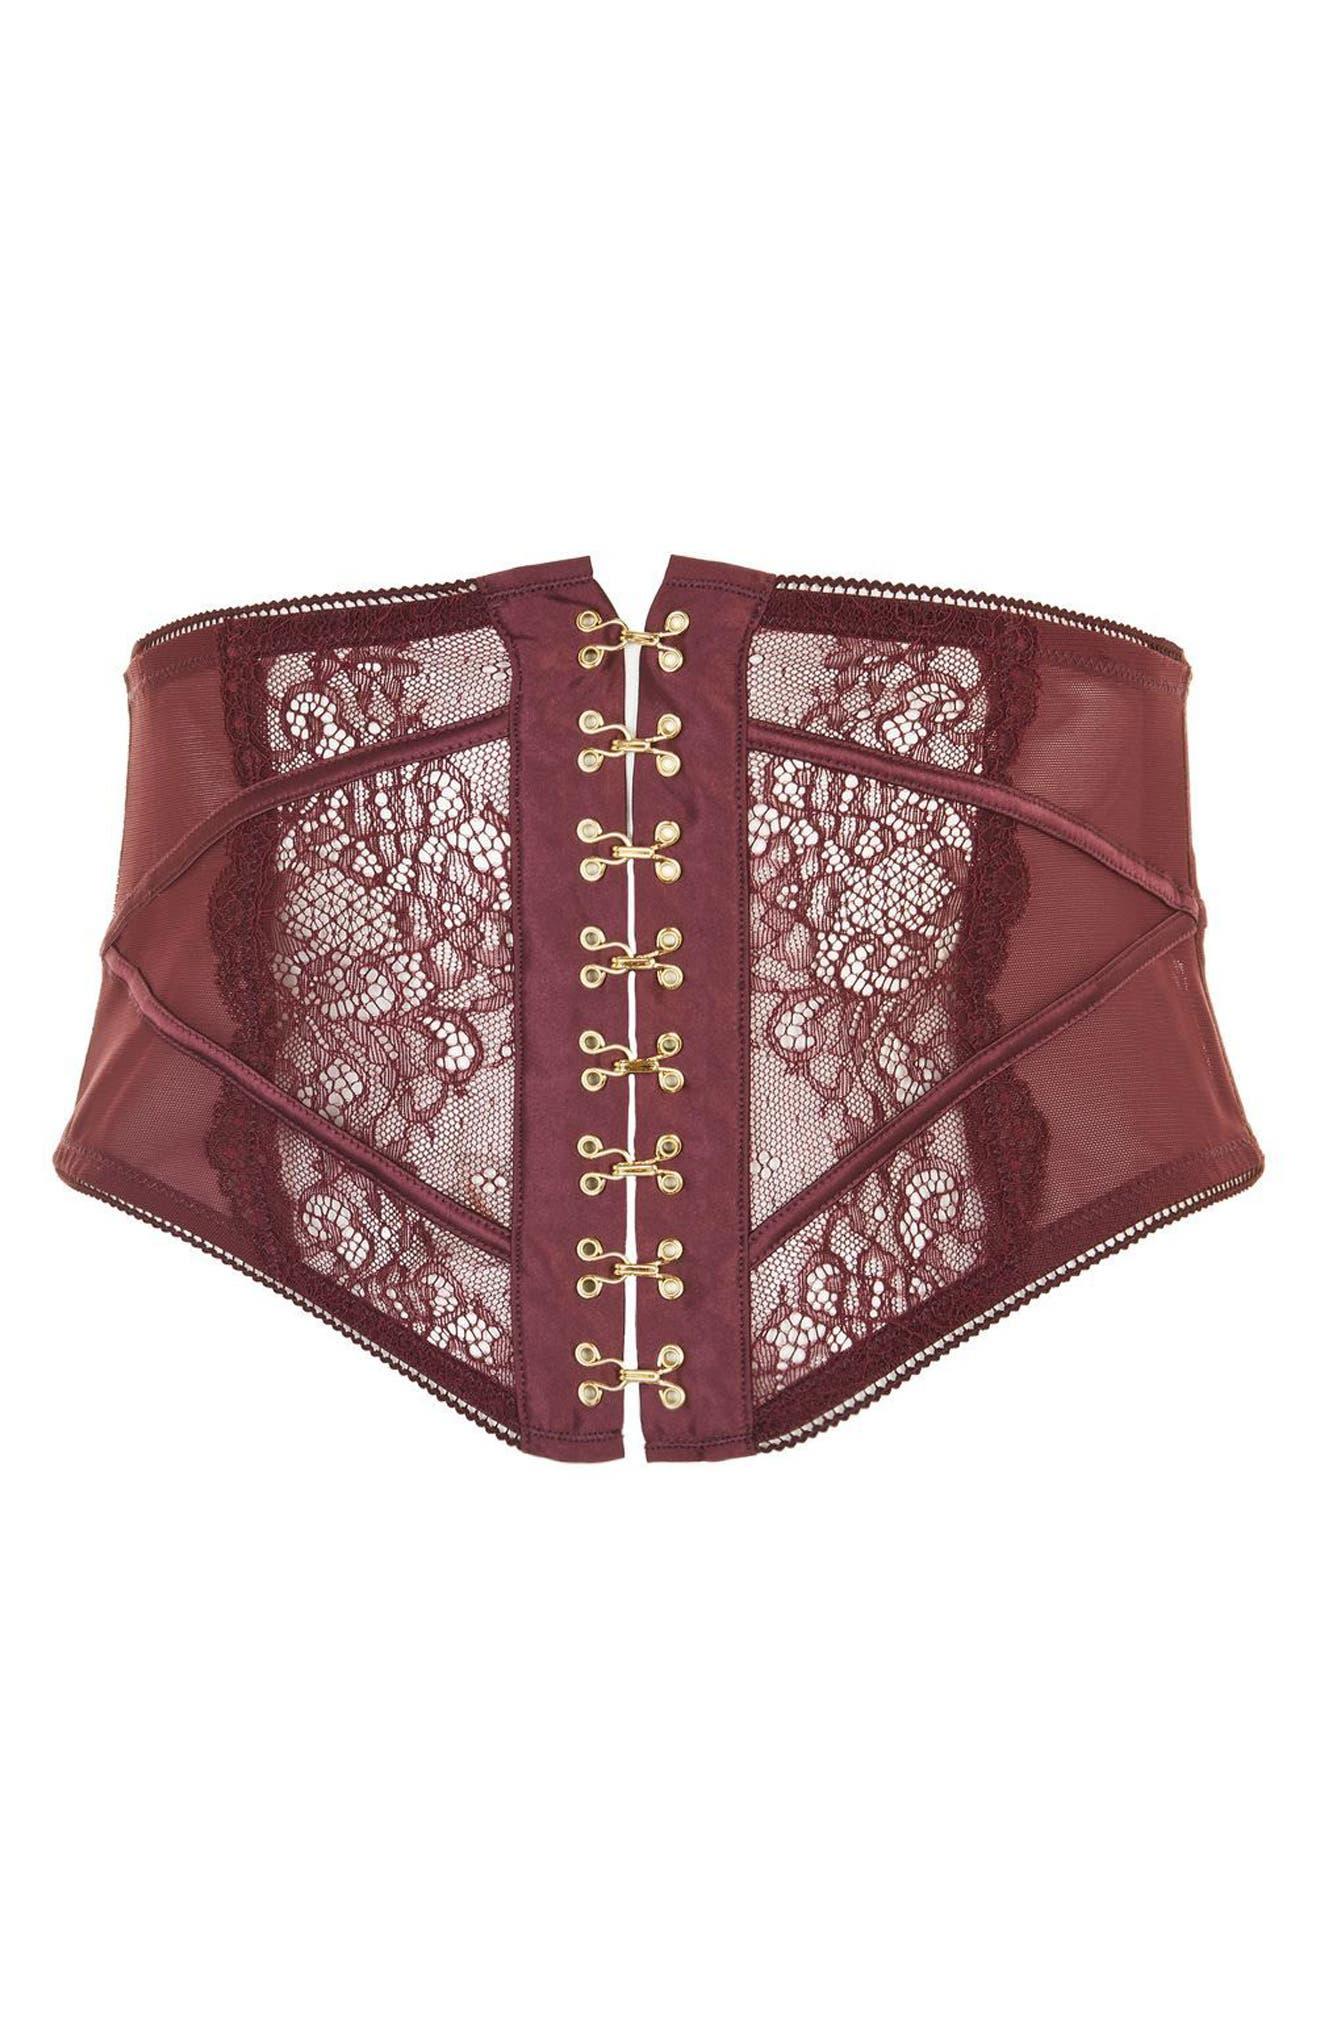 Waspie Lace Garter Belt,                             Alternate thumbnail 3, color,                             Berry